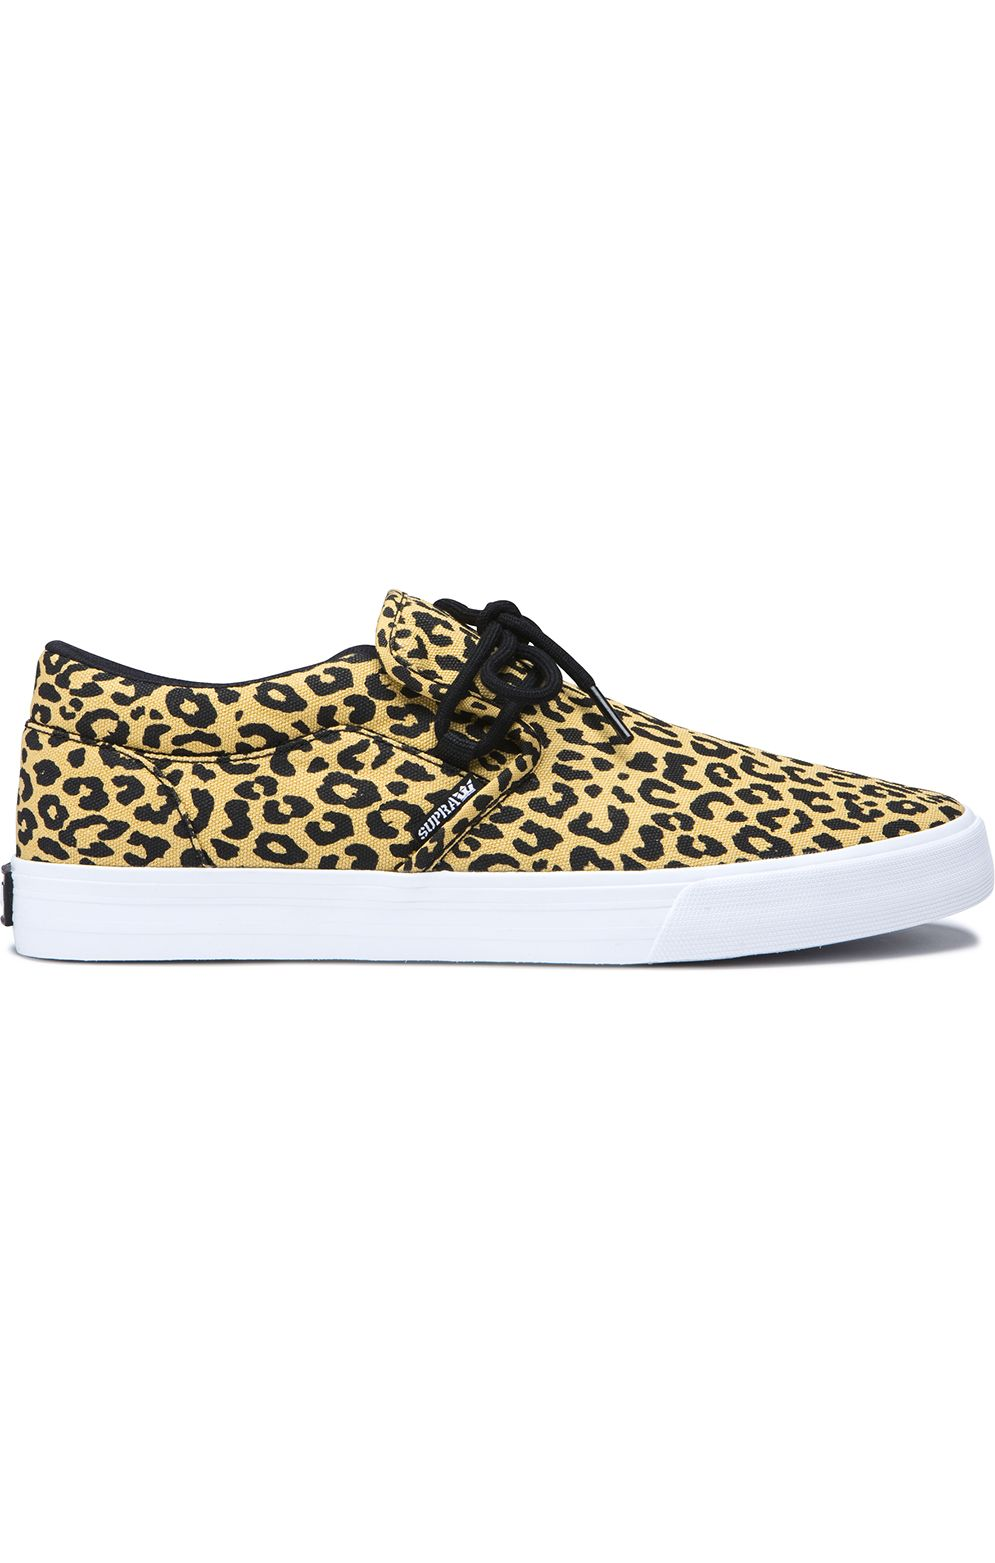 Supra Shoes CUBA Animal/Black